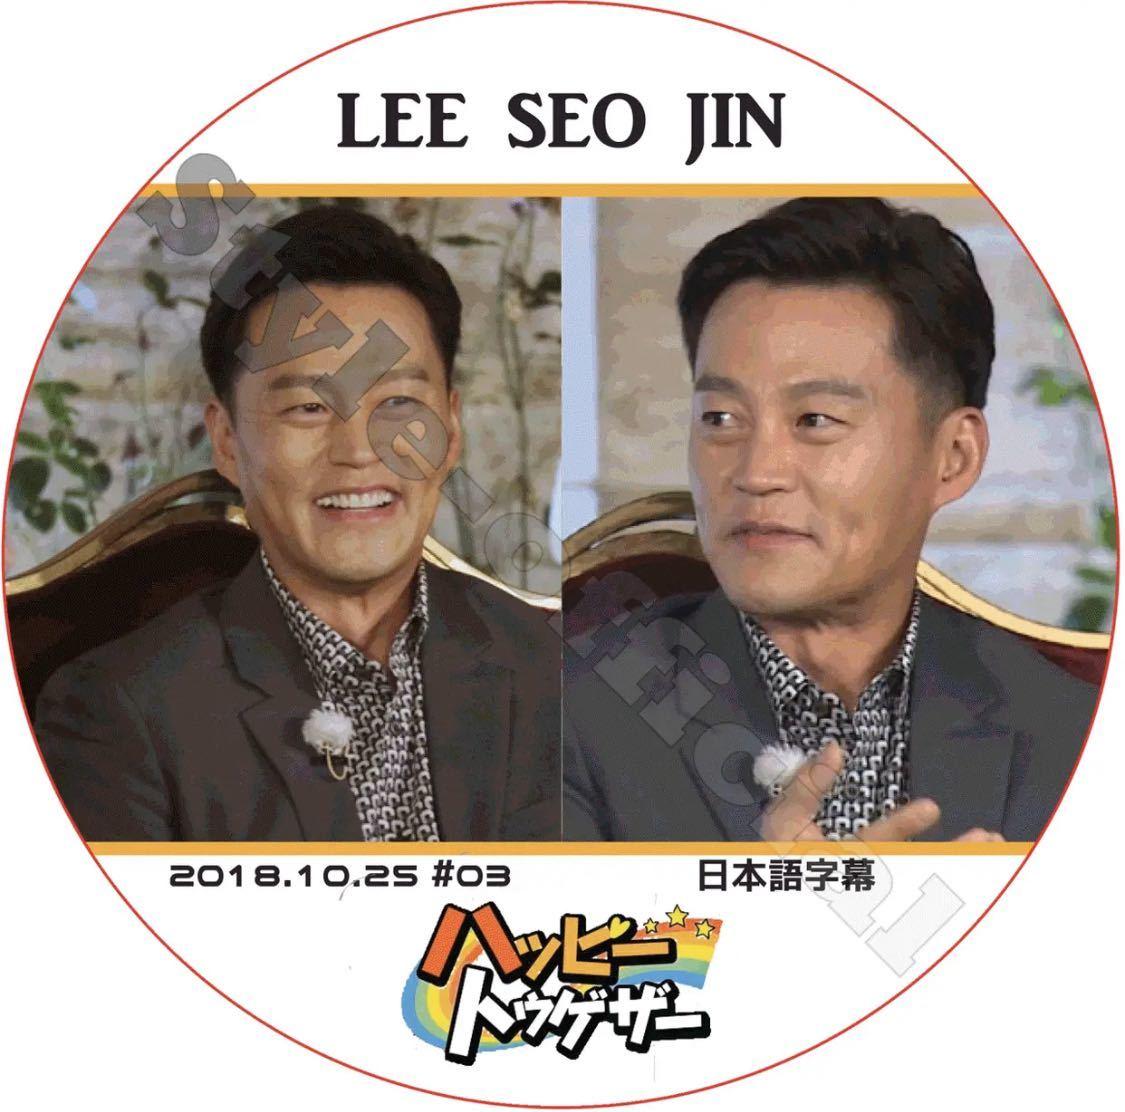 [K-POP DVD] イソジン ハッピートゥゲザー (2018.10.25) 日本語字幕 / LEE SEO JIN